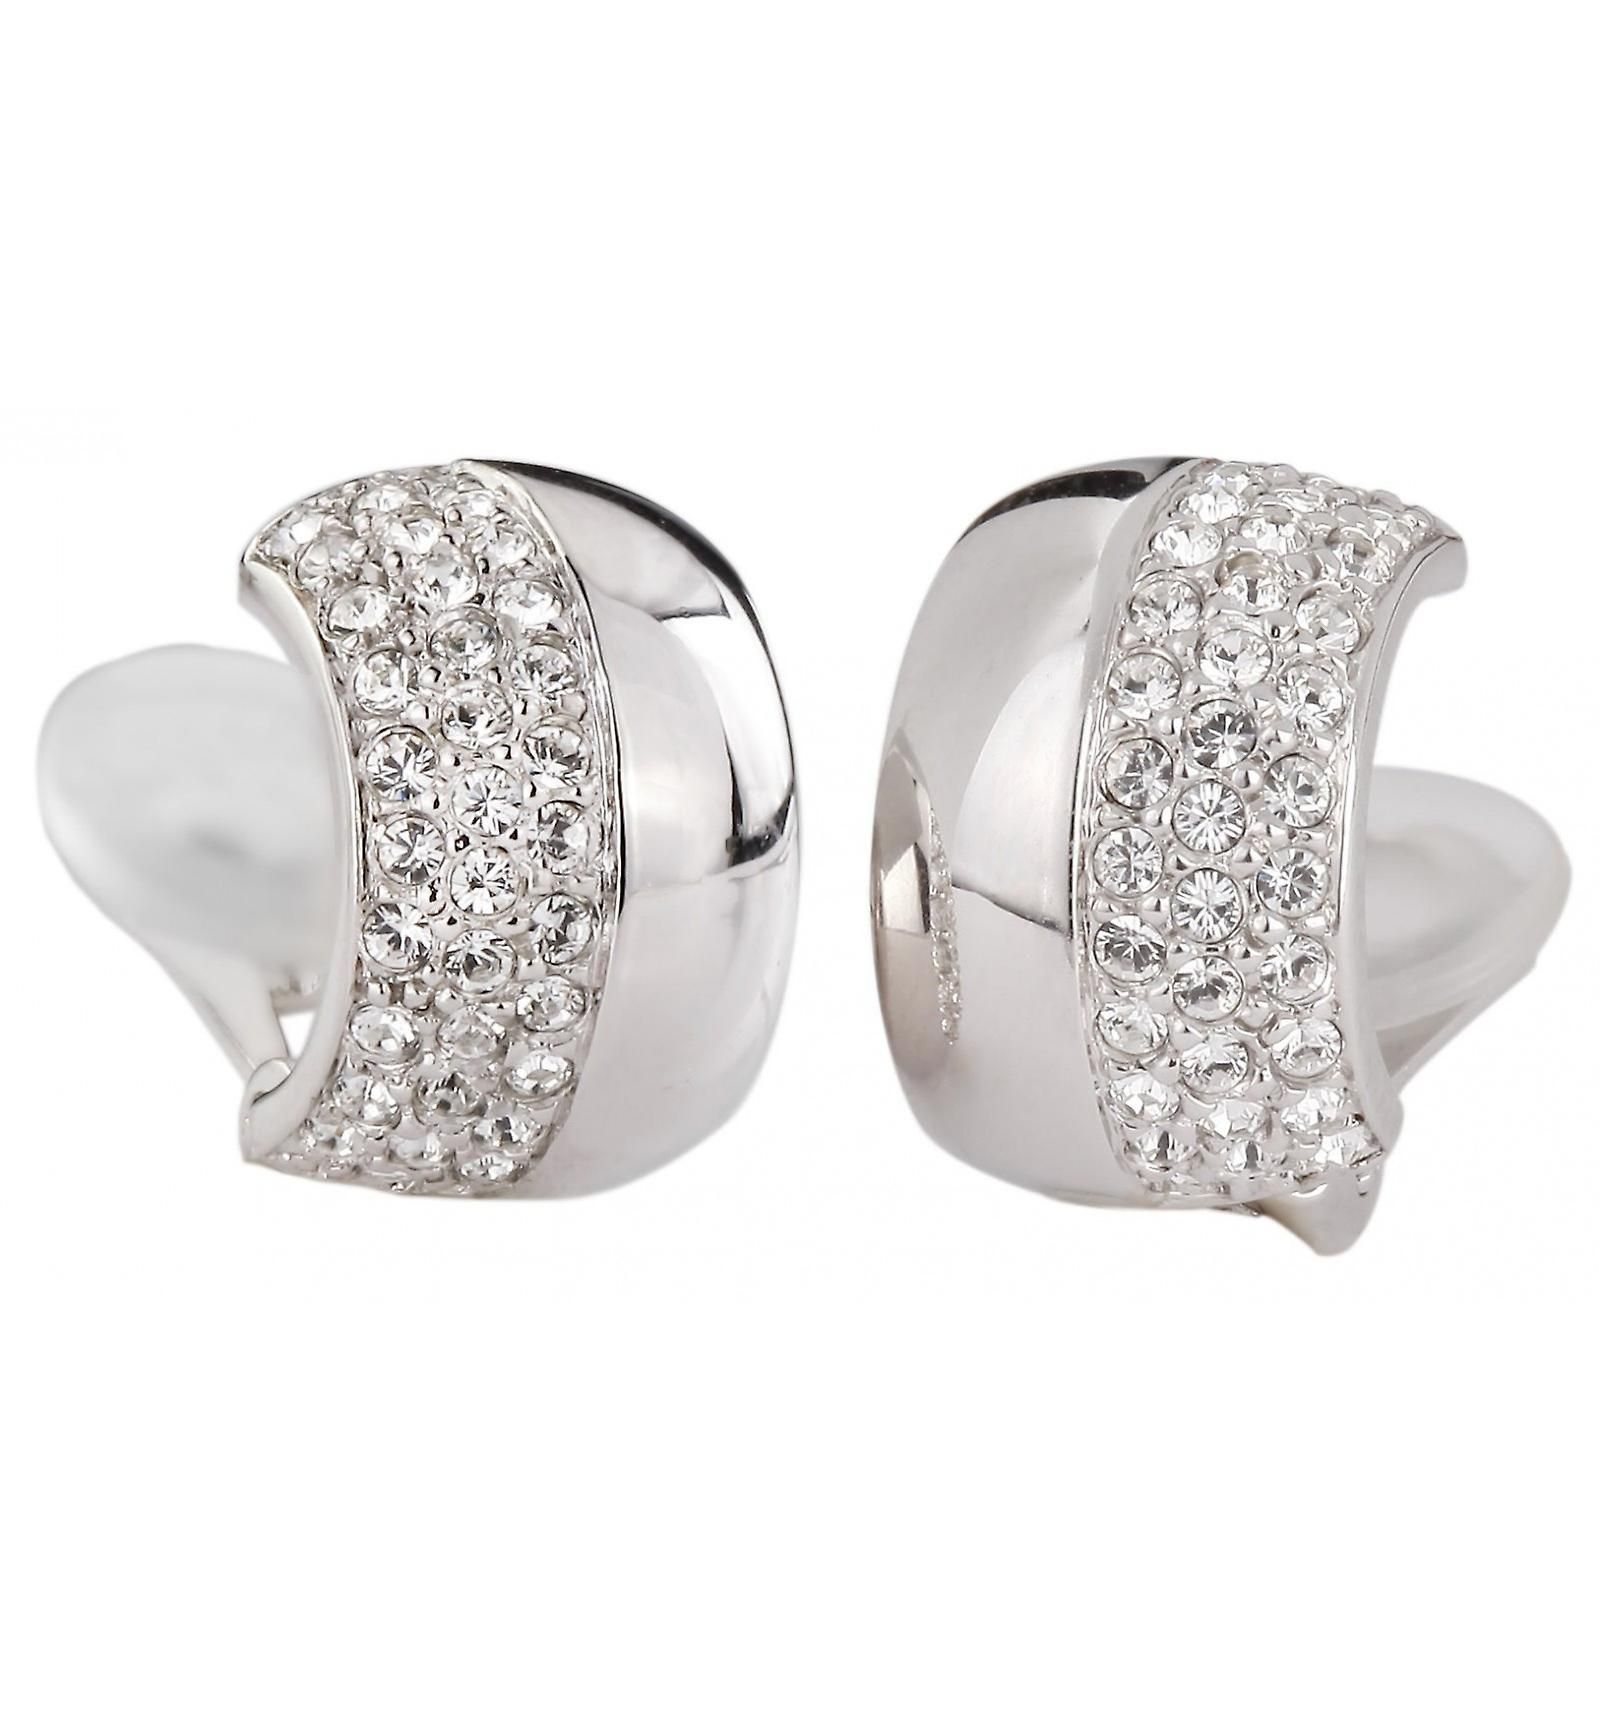 Traveller clip earring - rhodium plated - Swarovski Crystals - 156577